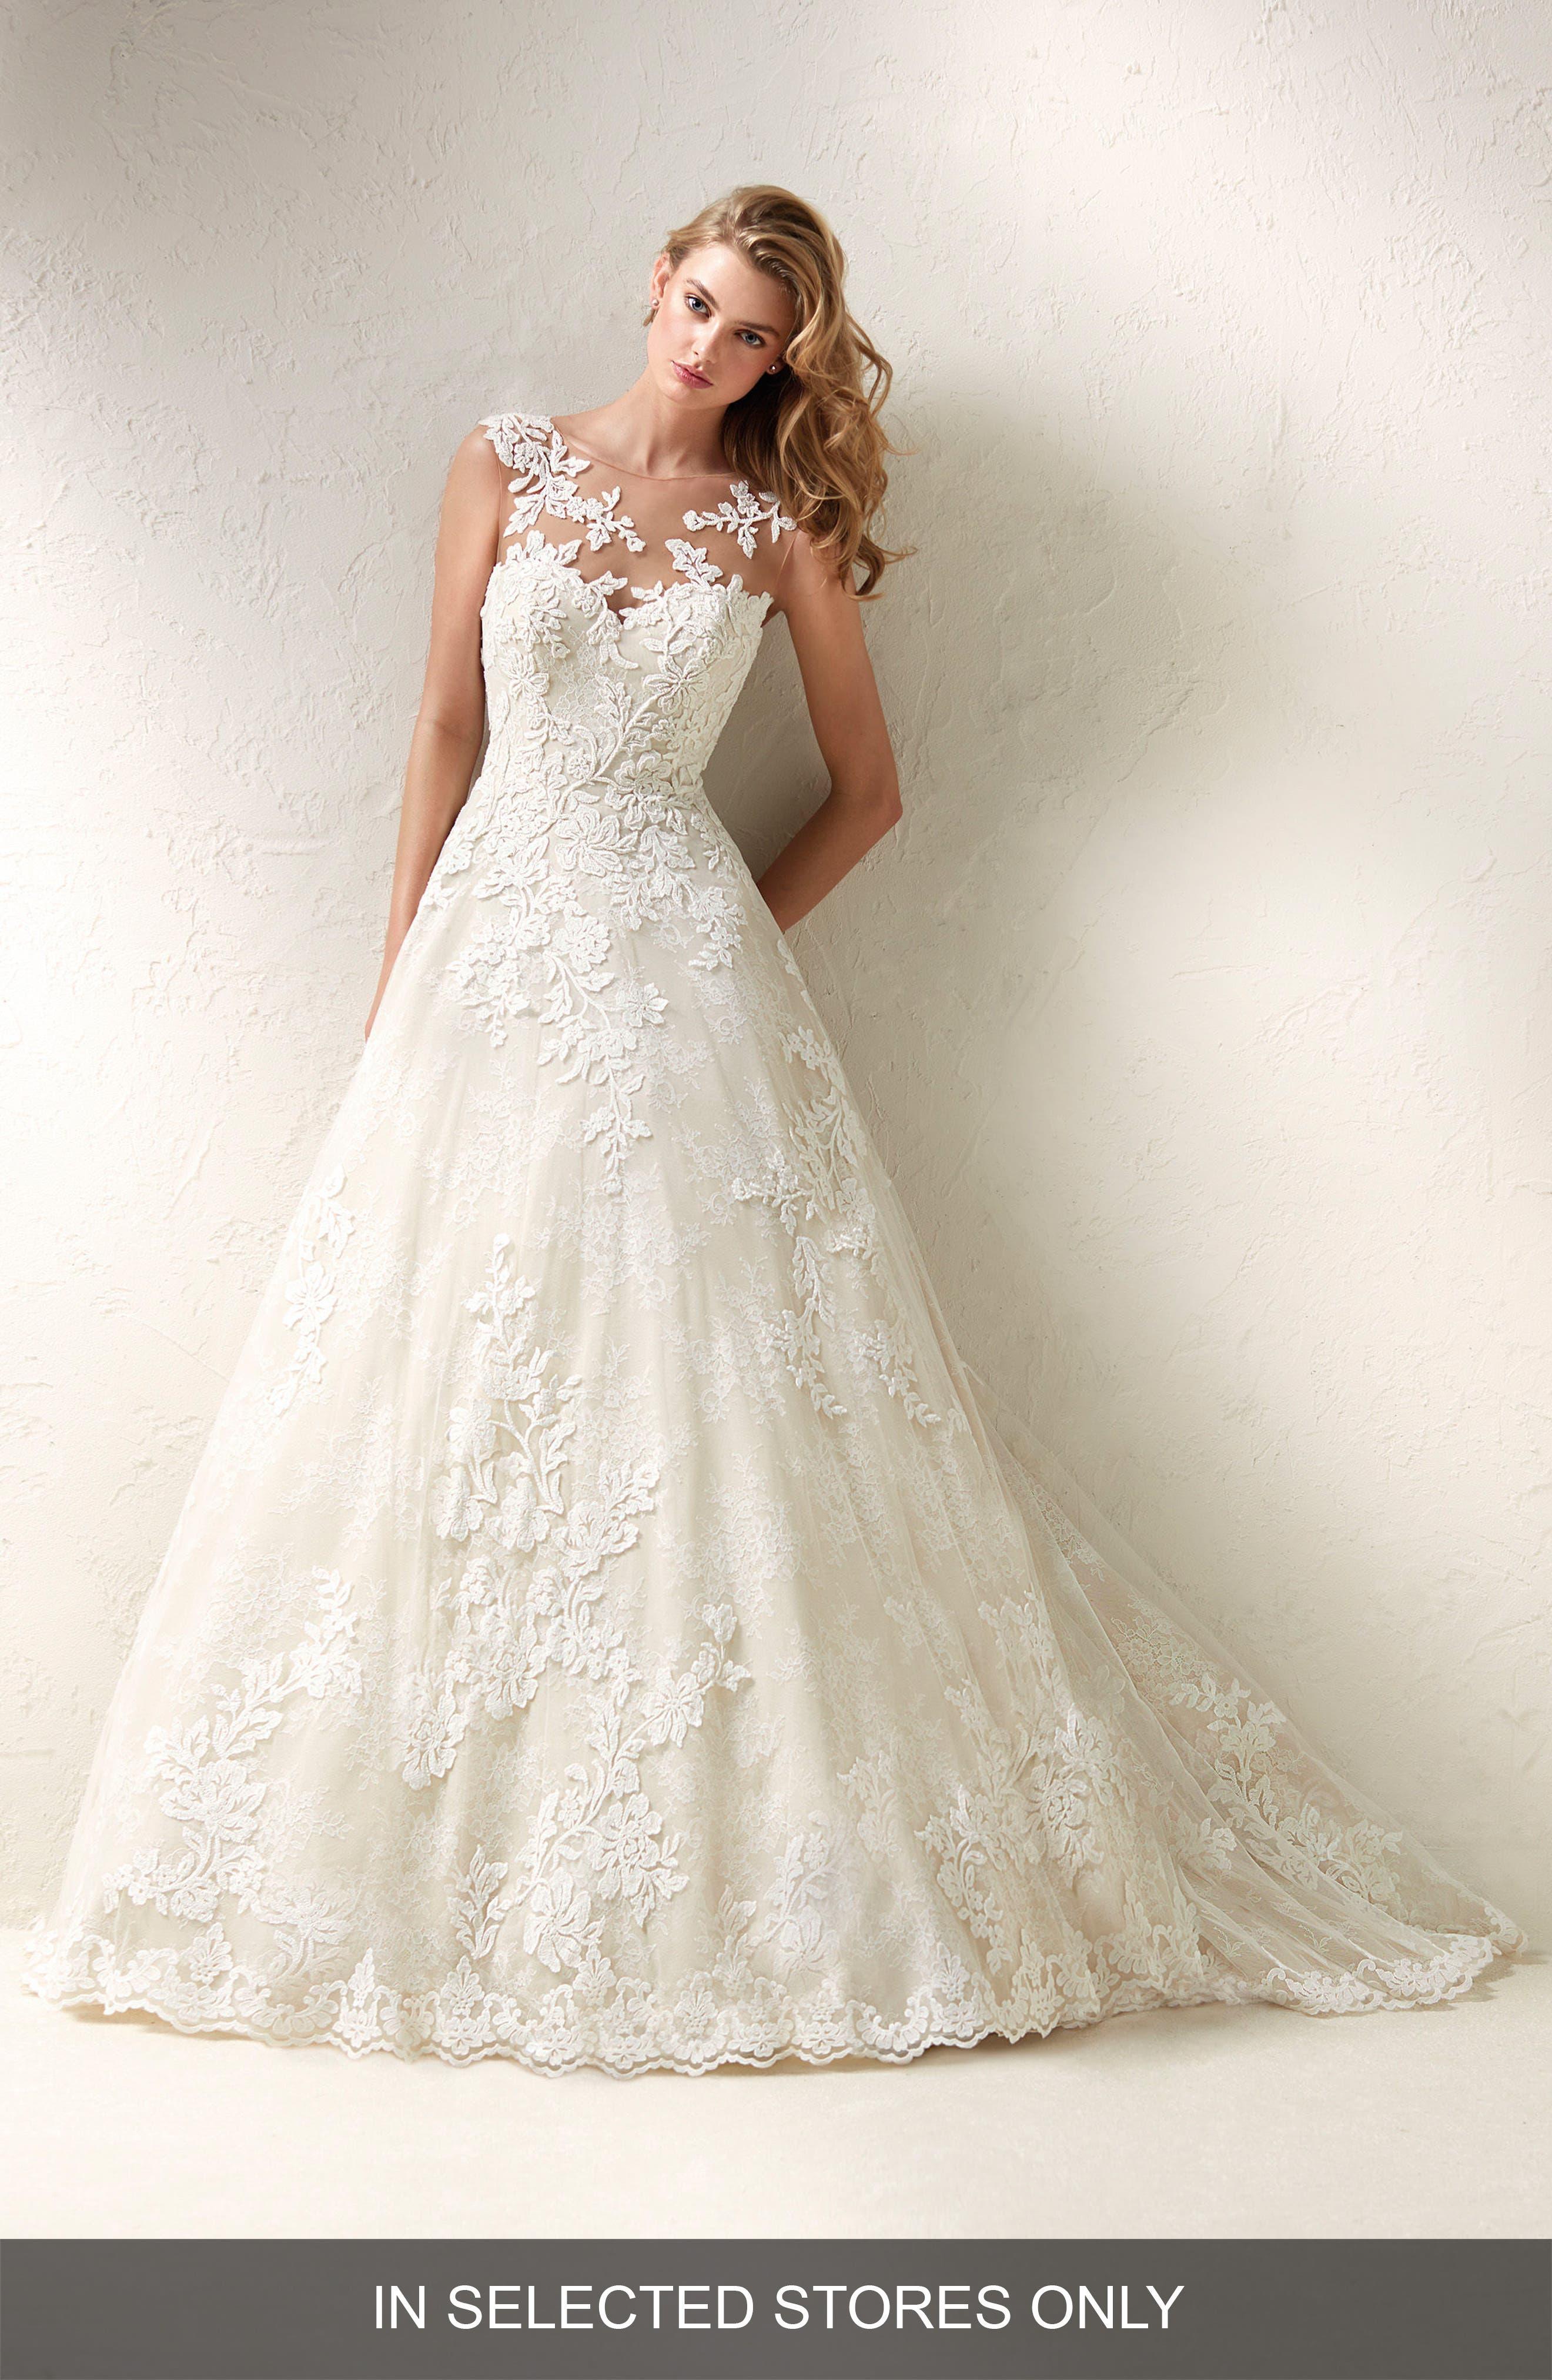 Dracme Illusion Bodice Lace A-Line Gown,                         Main,                         color, Off White